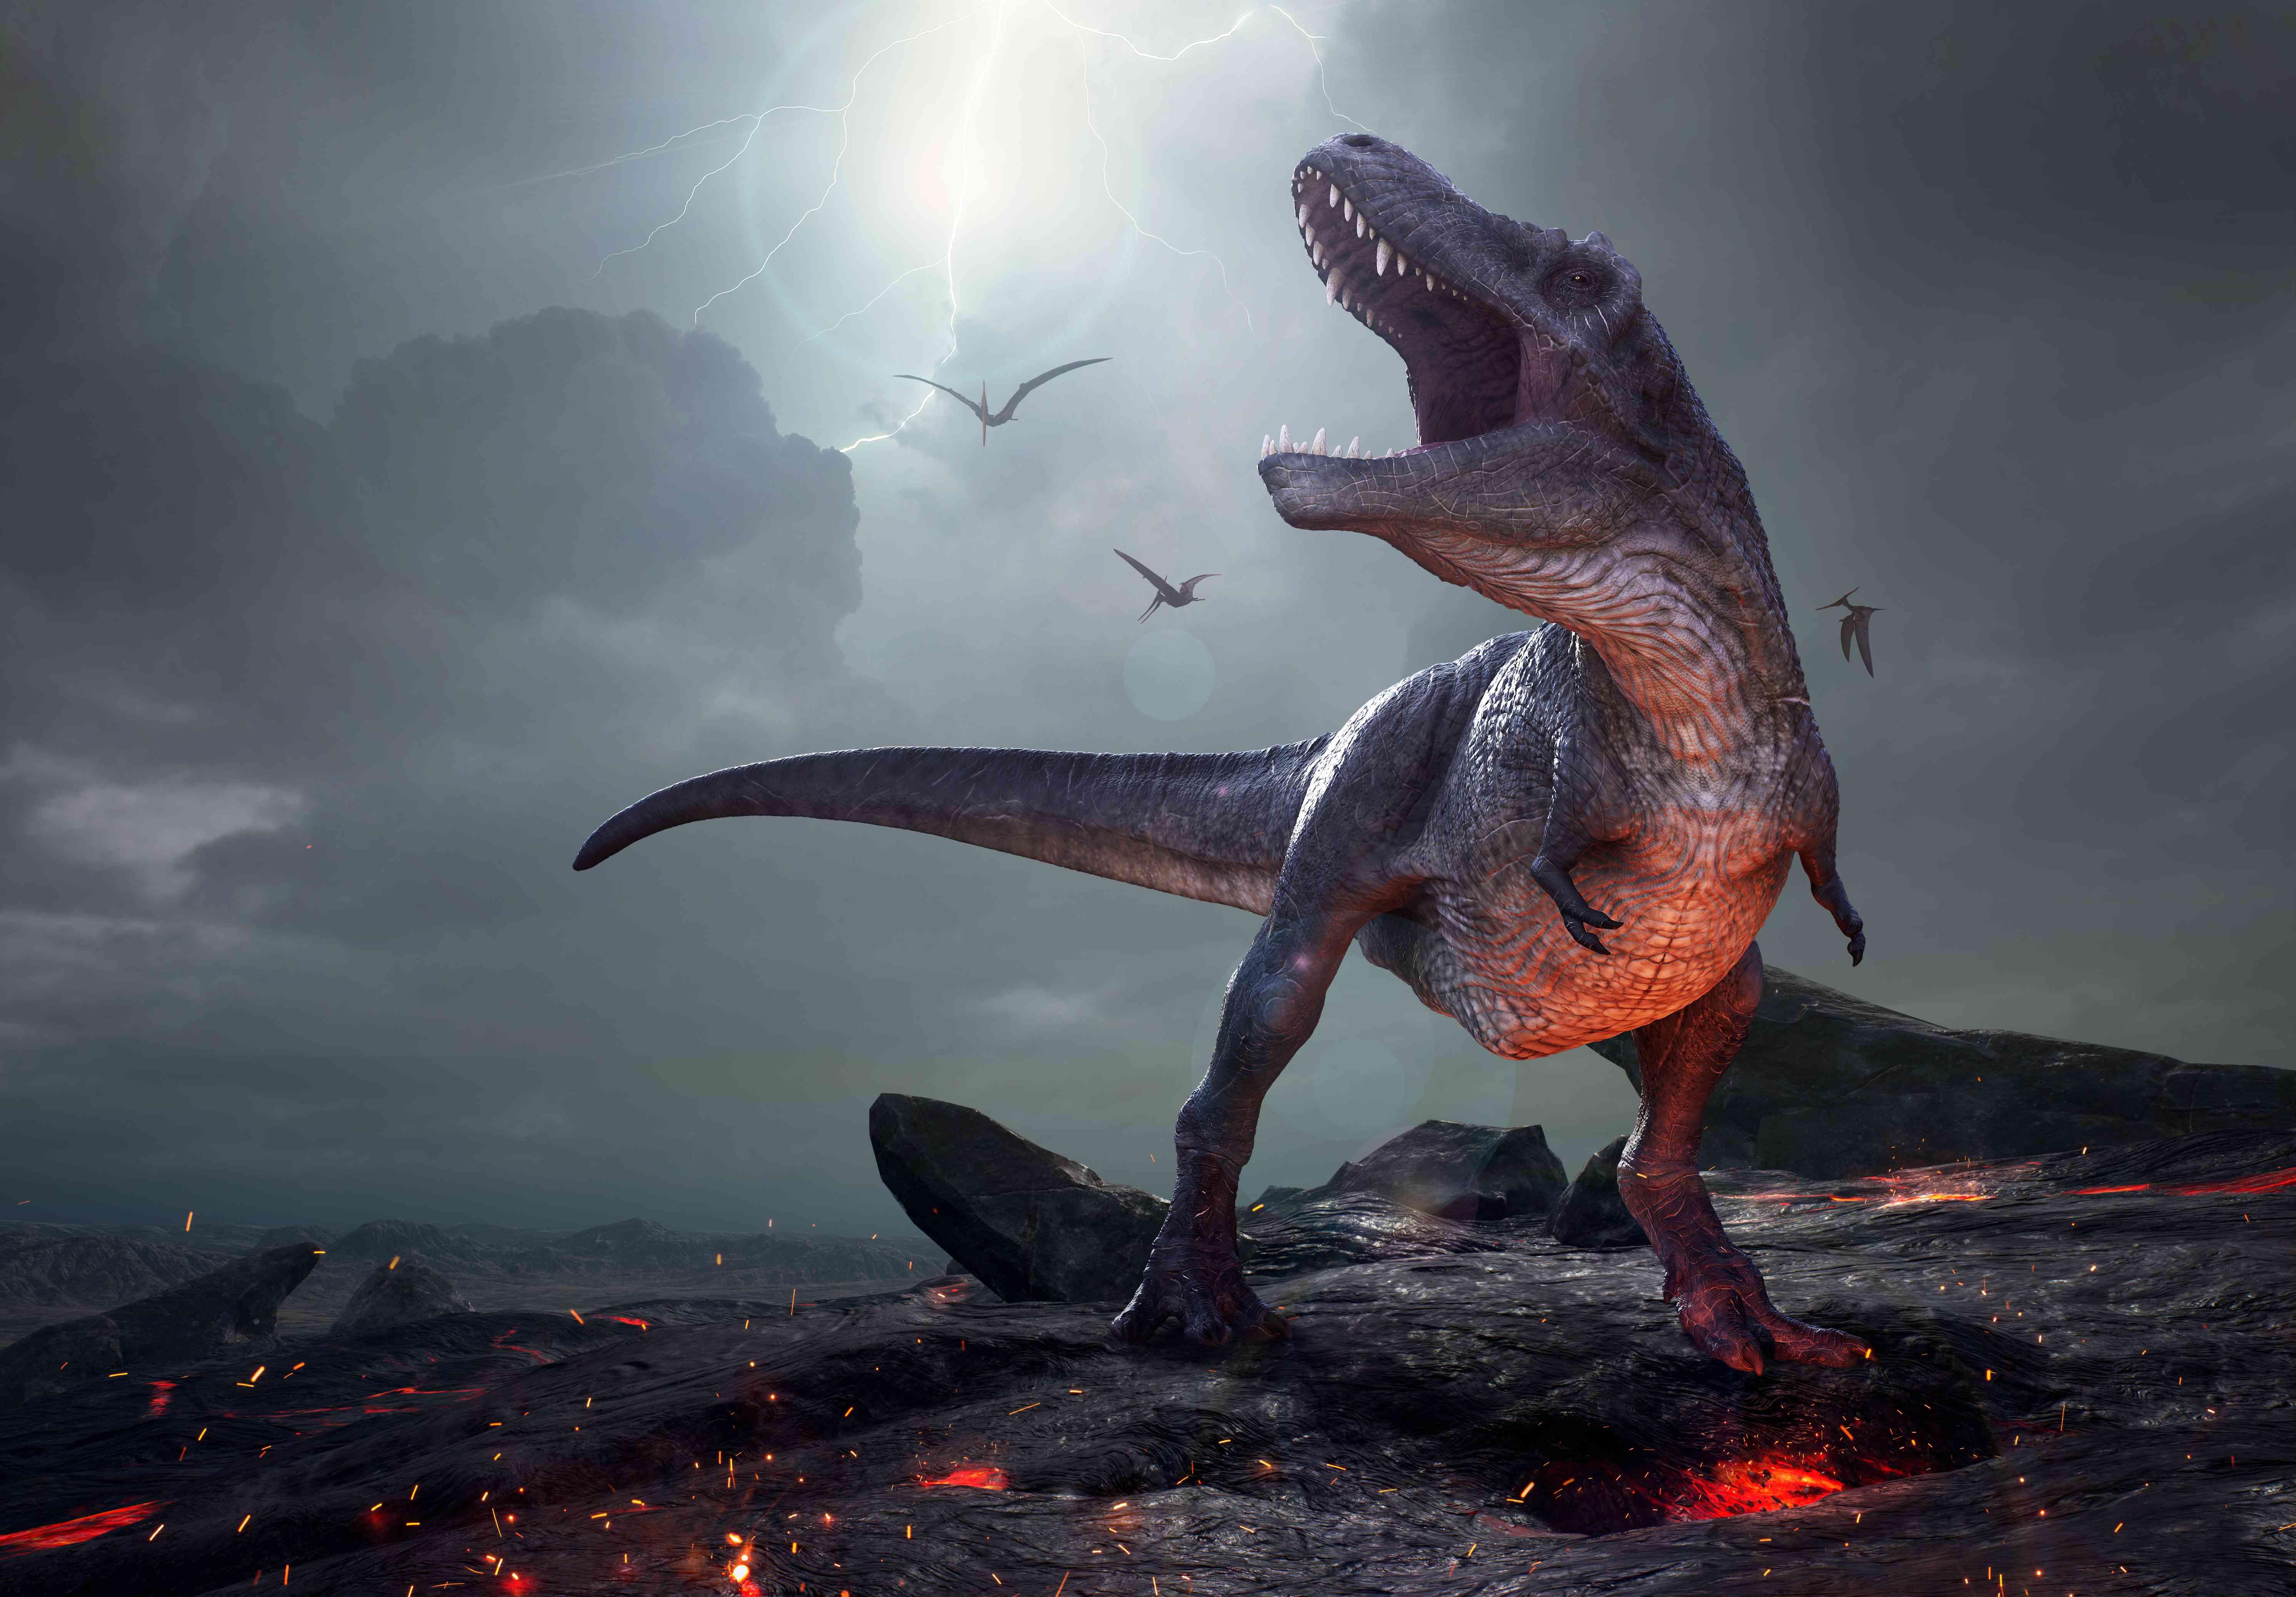 An illustration of a T. rex during the Cretaceous extinction